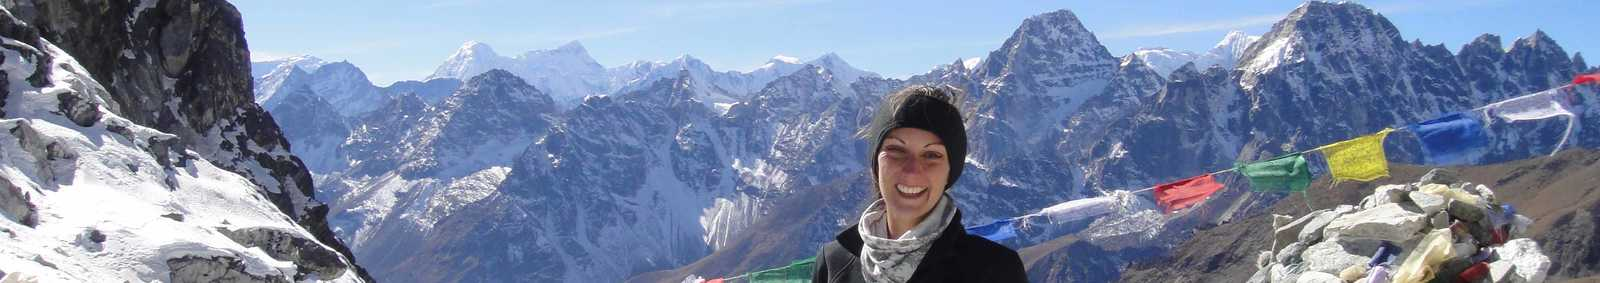 Jenny atop the Cho La Pass, Nepal